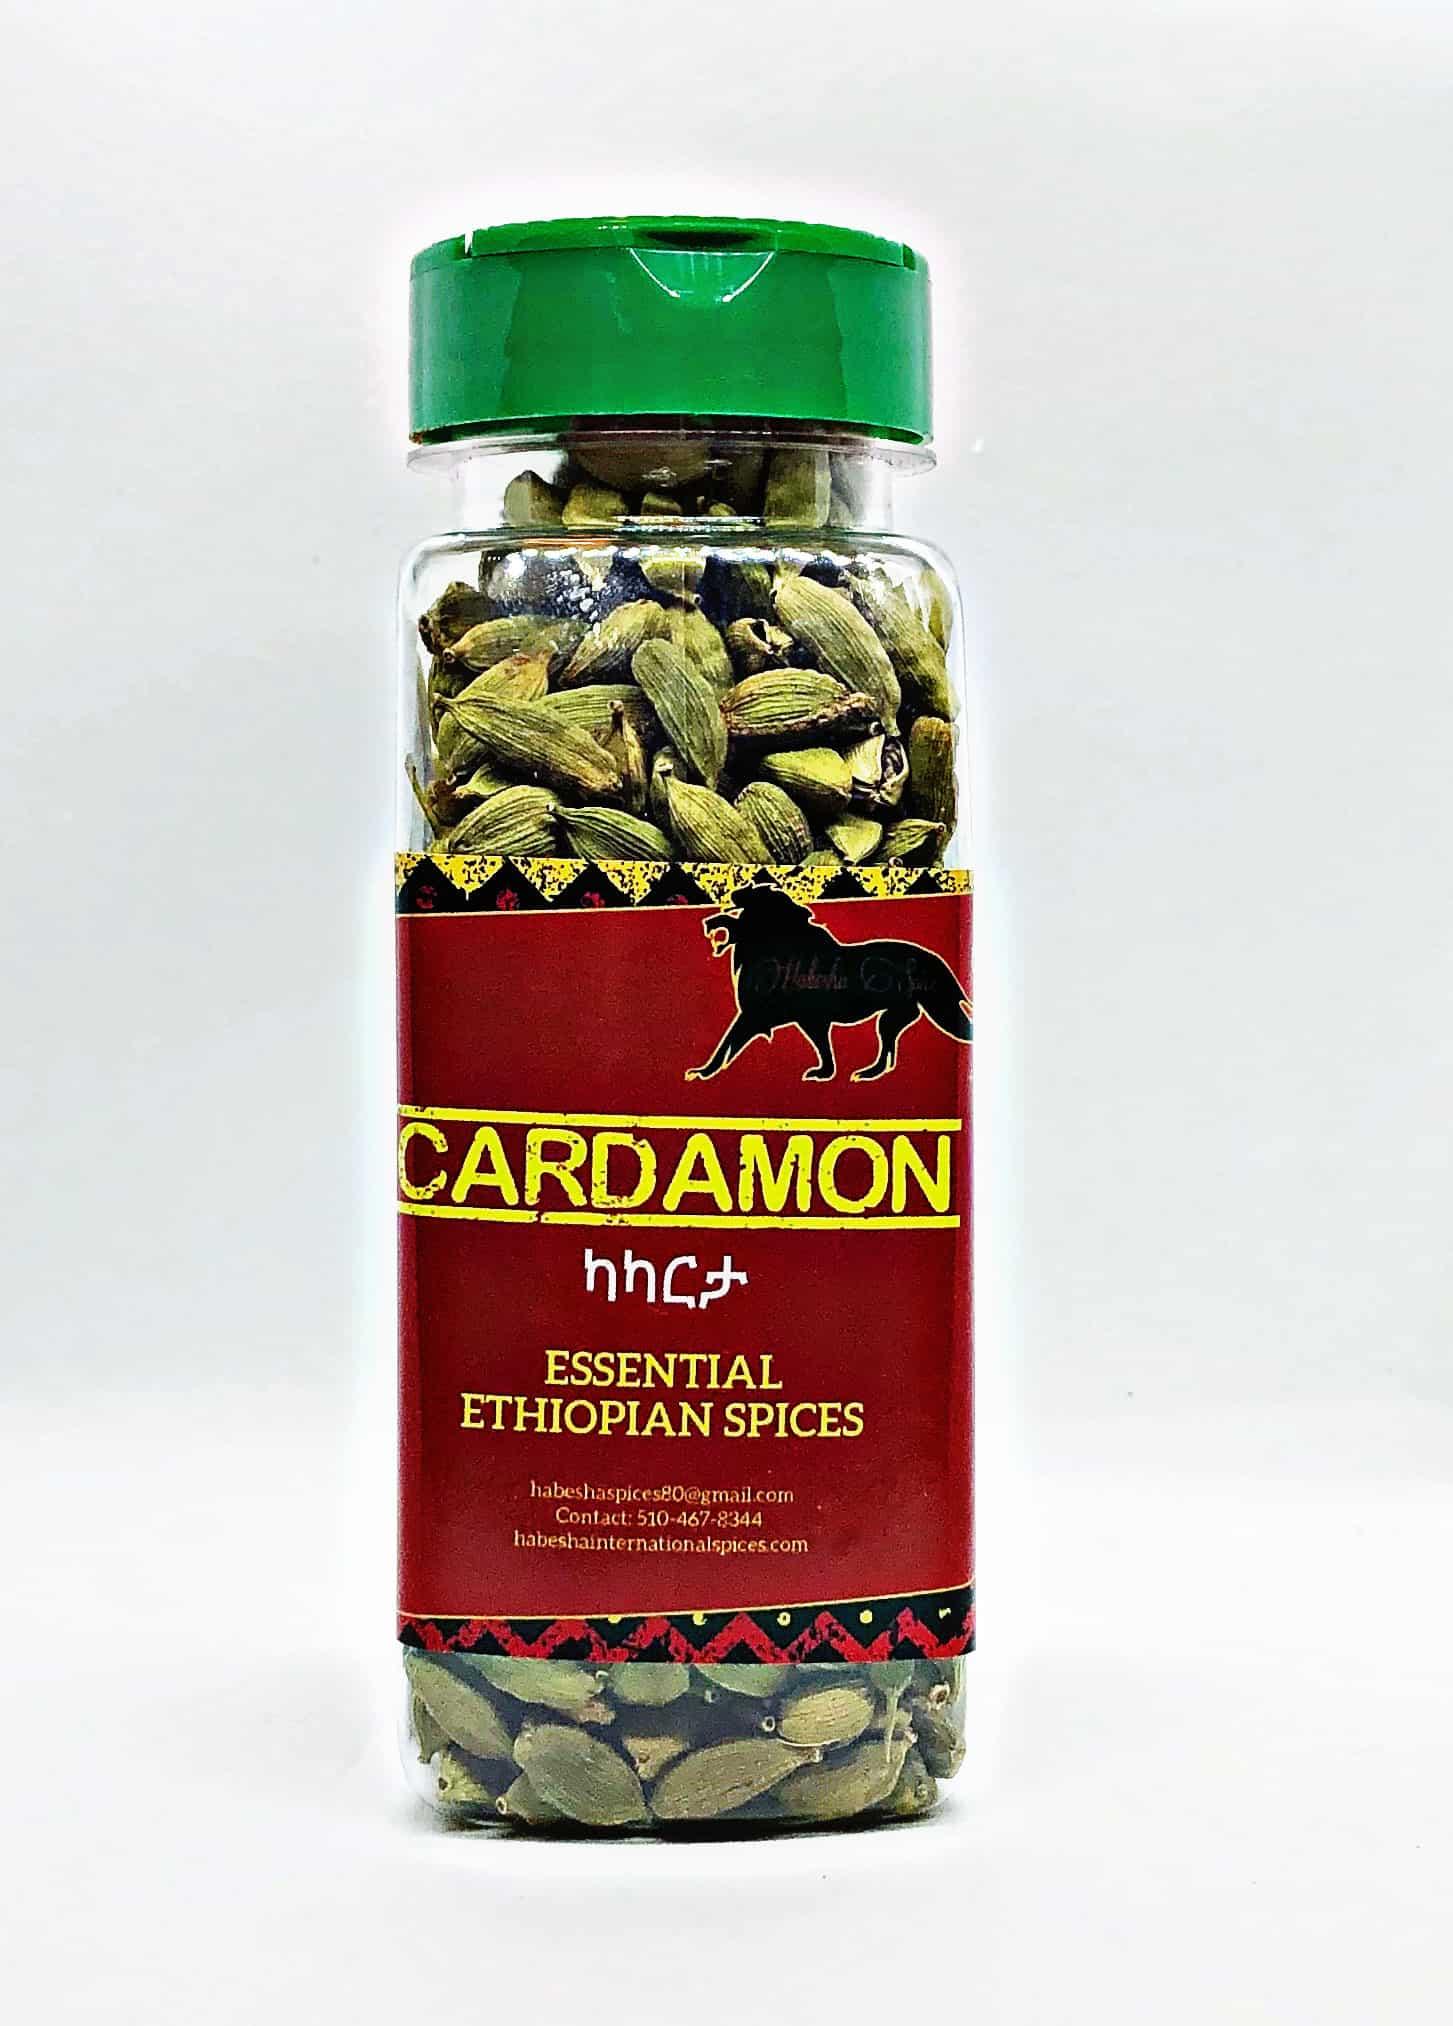 Cardamon Product Image